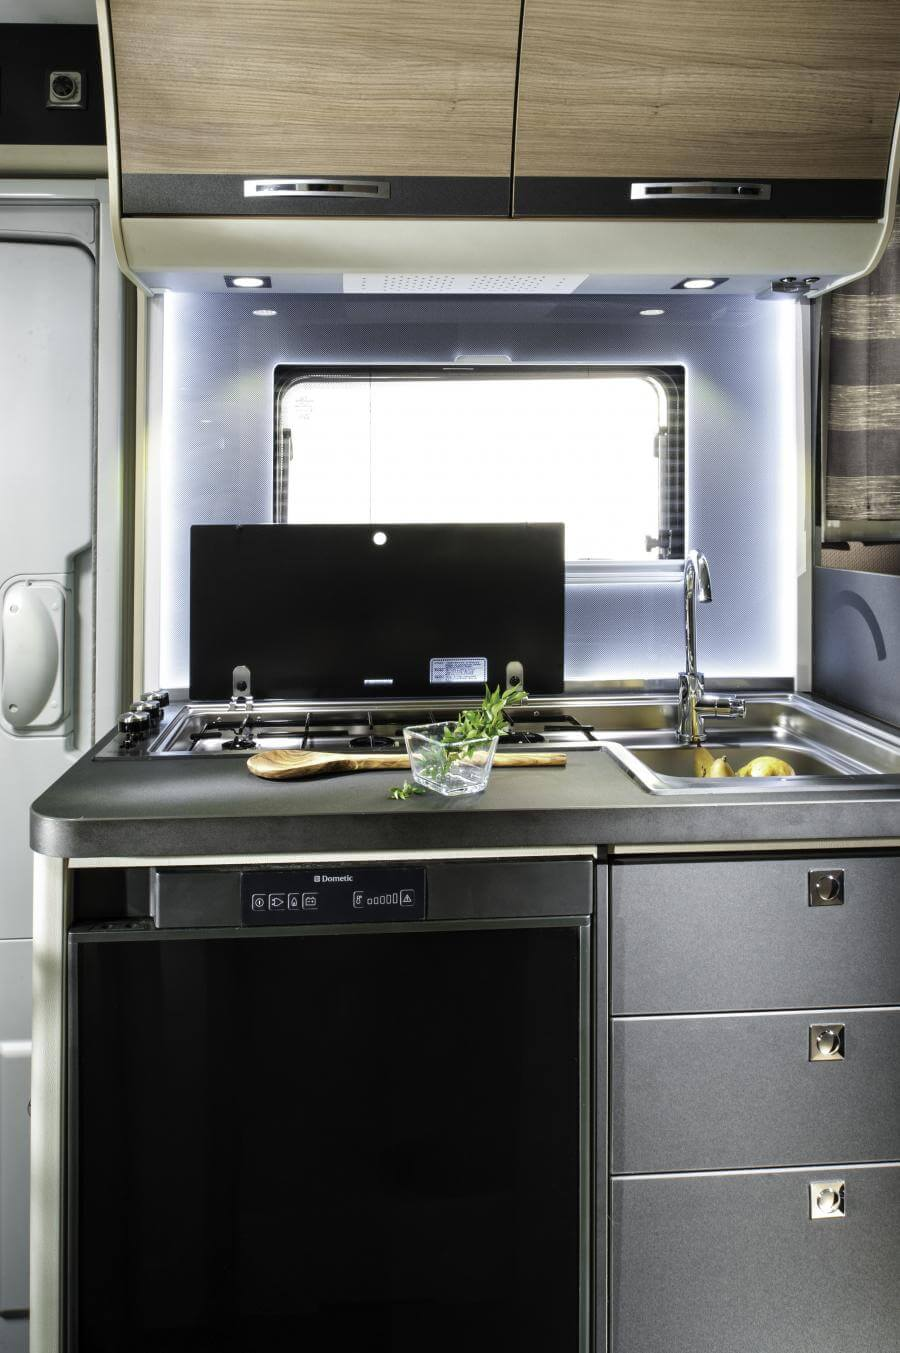 No. 10. 5005 Compact Sl Kitchen Jmf 8695